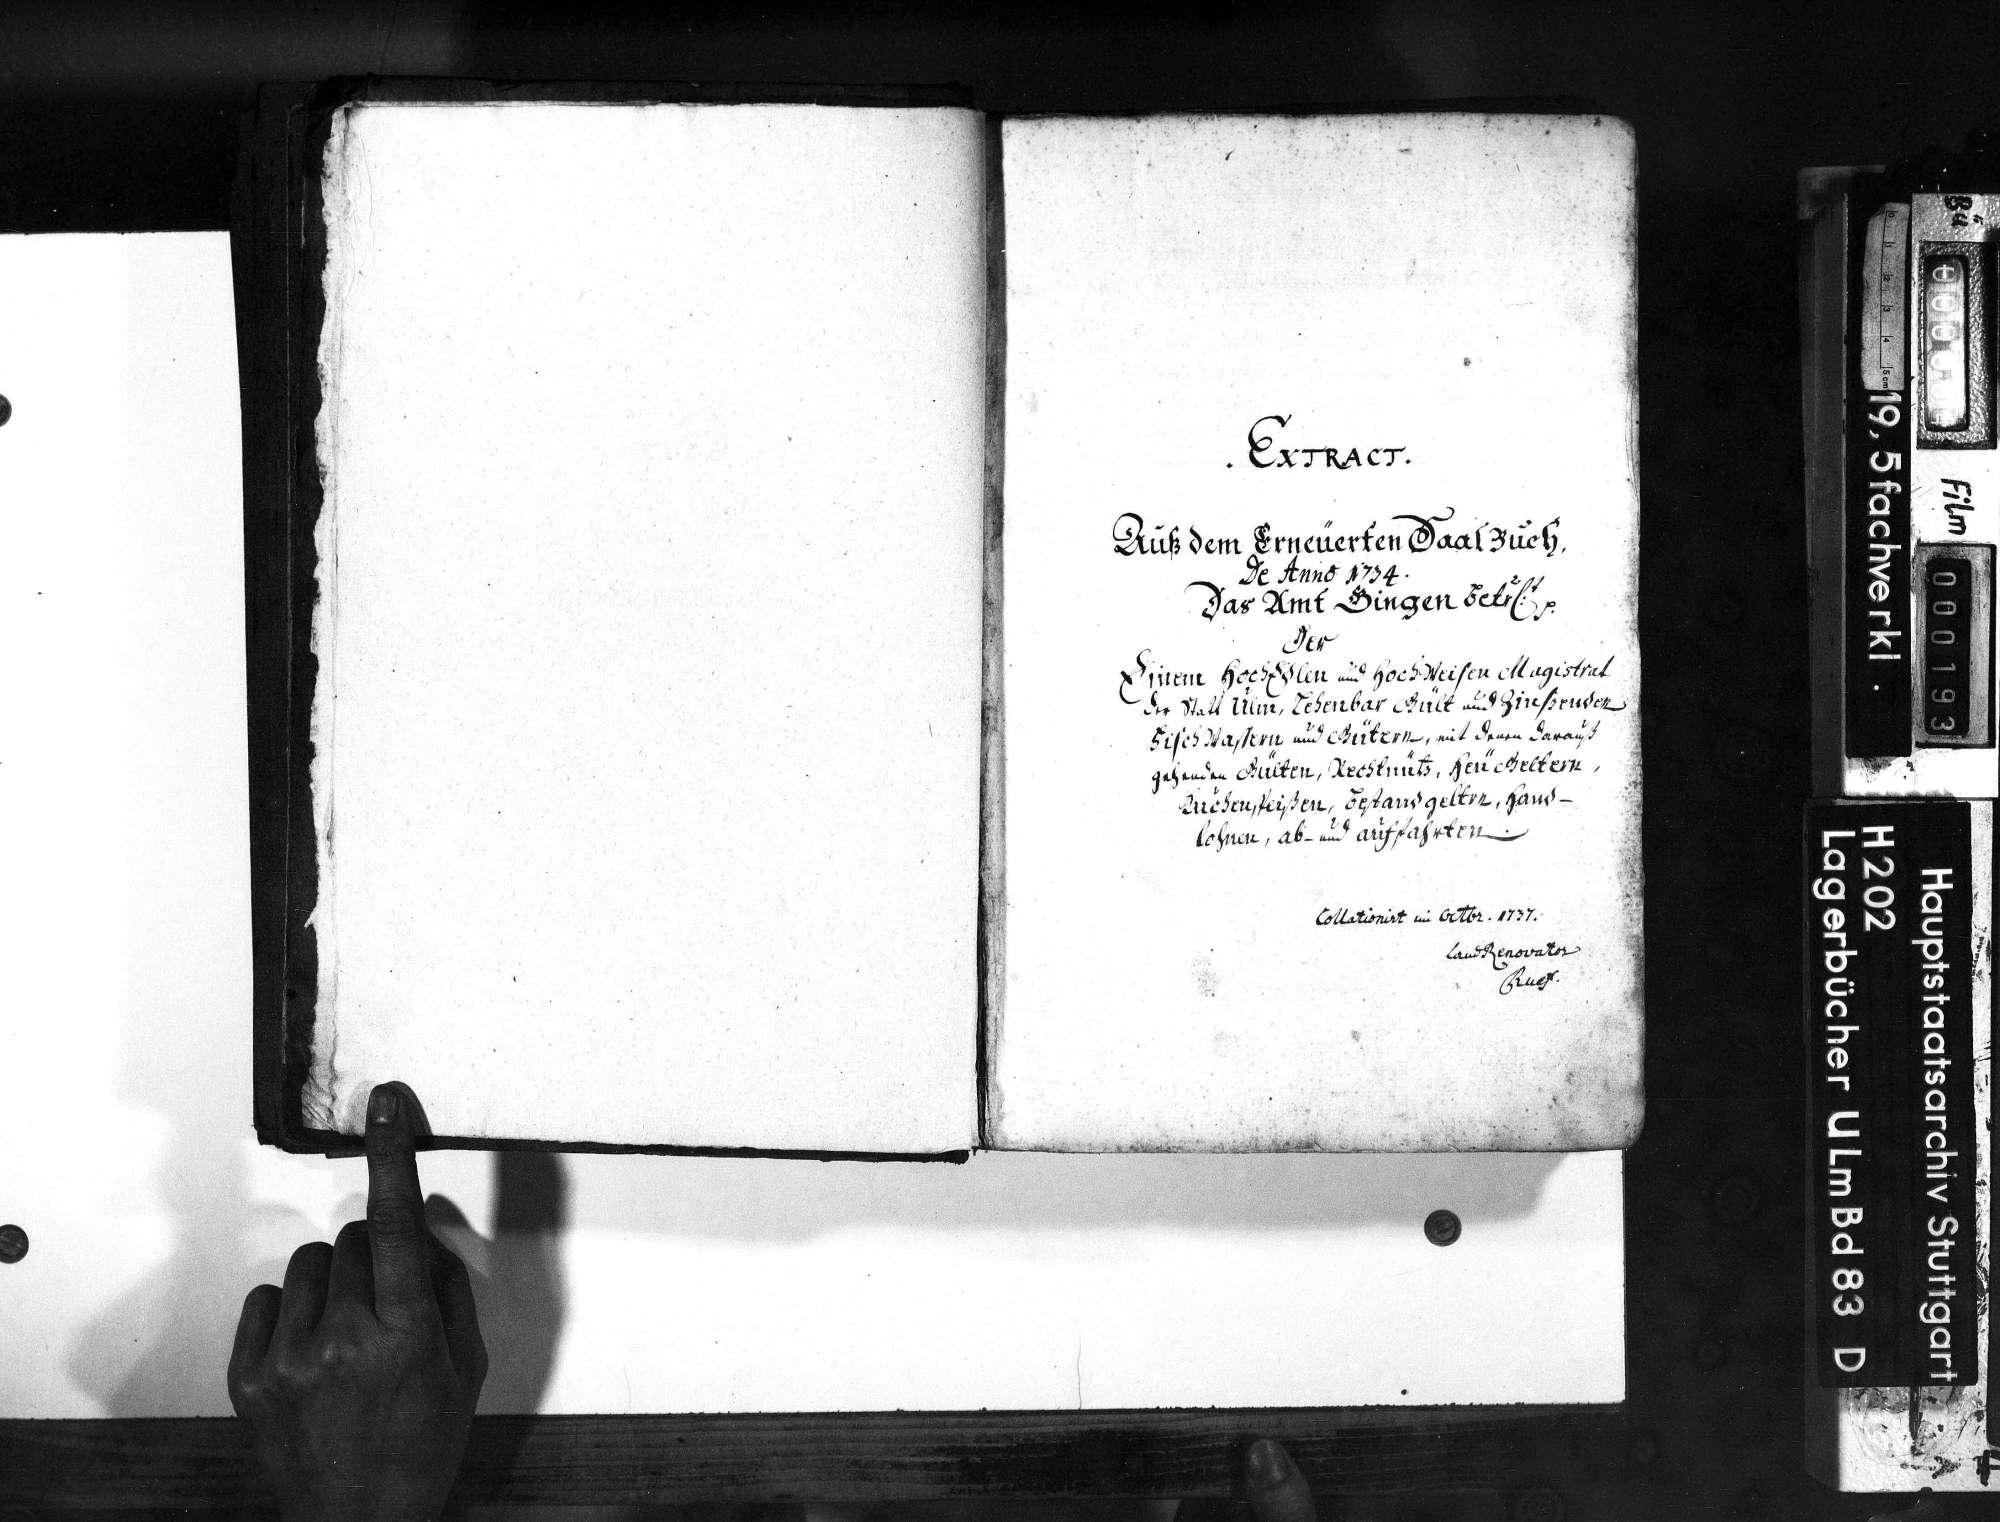 Gingen an der Fils 1. Bd., Bild 3